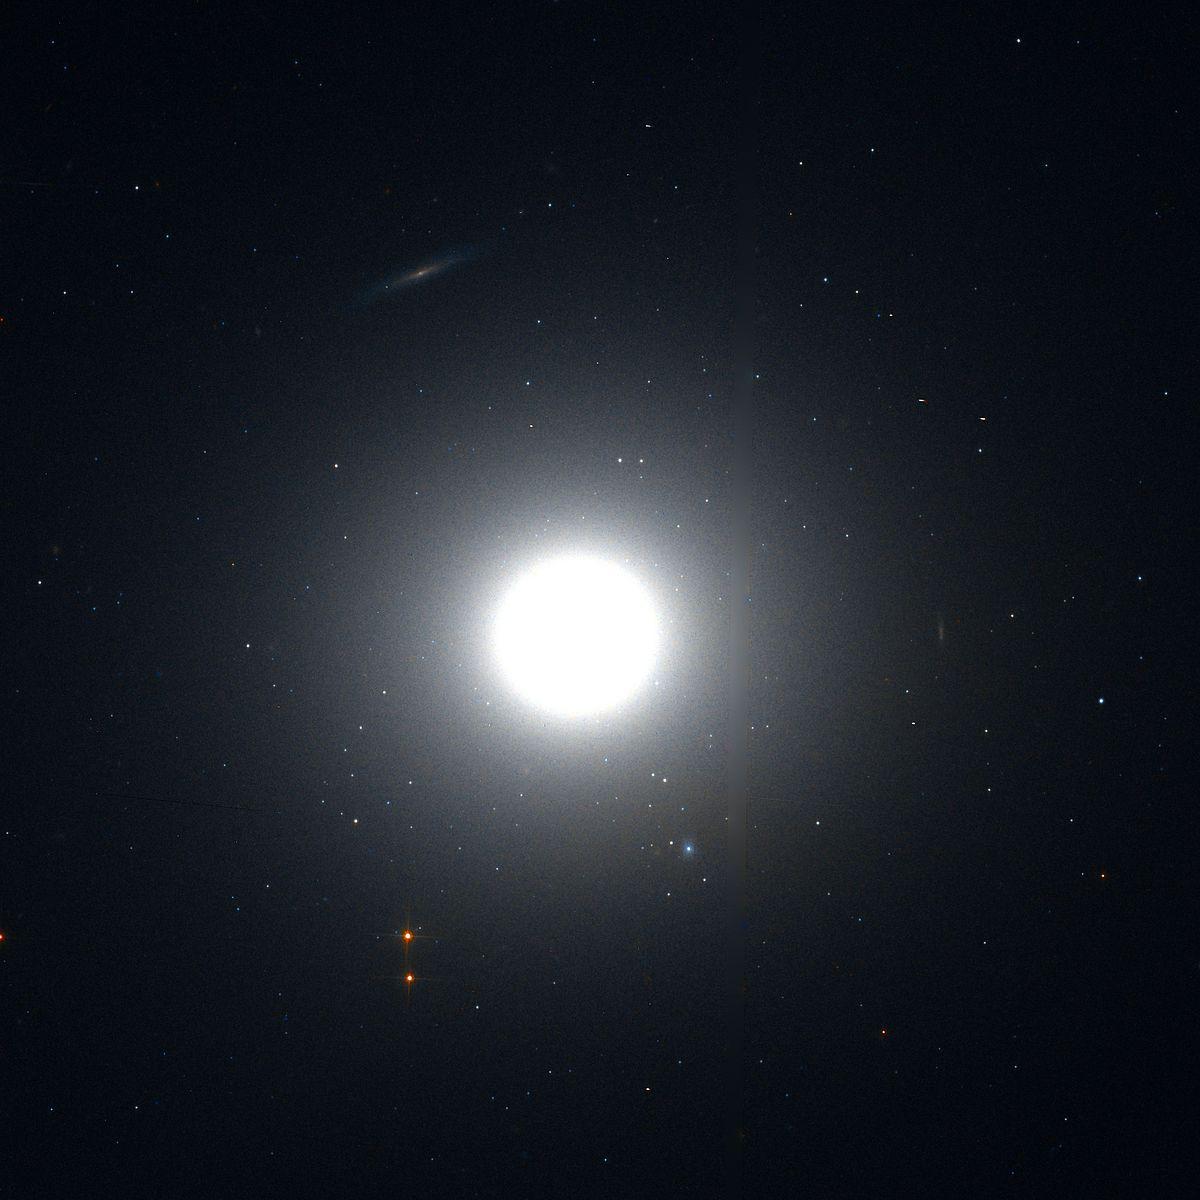 Messier 89 Wikipedia